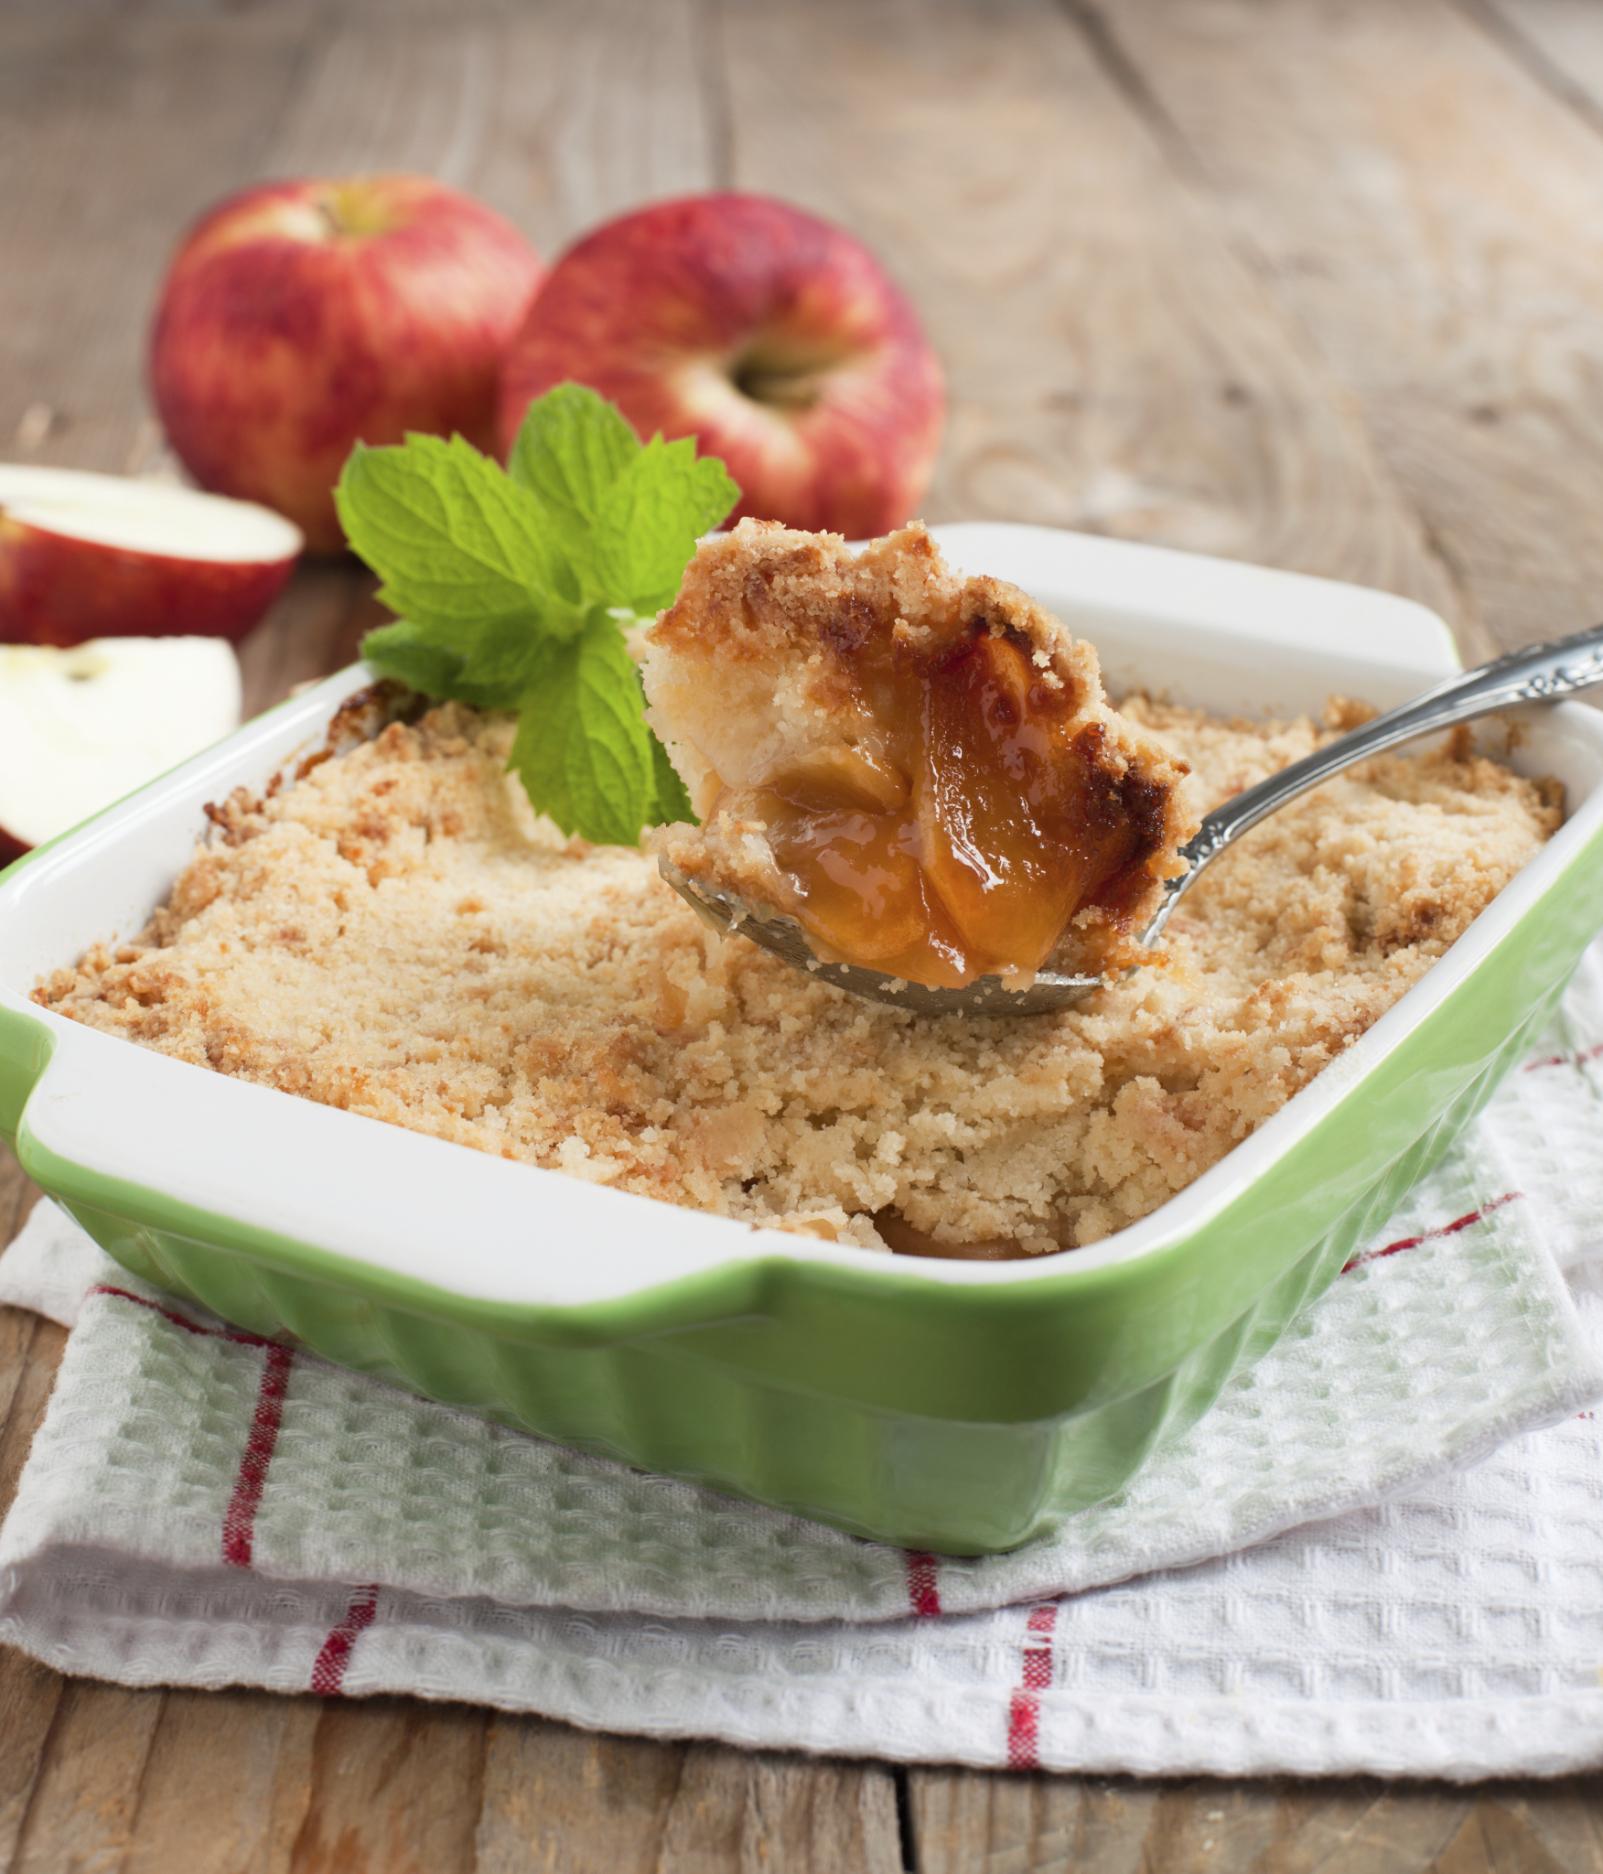 Tarta de manzana para niños